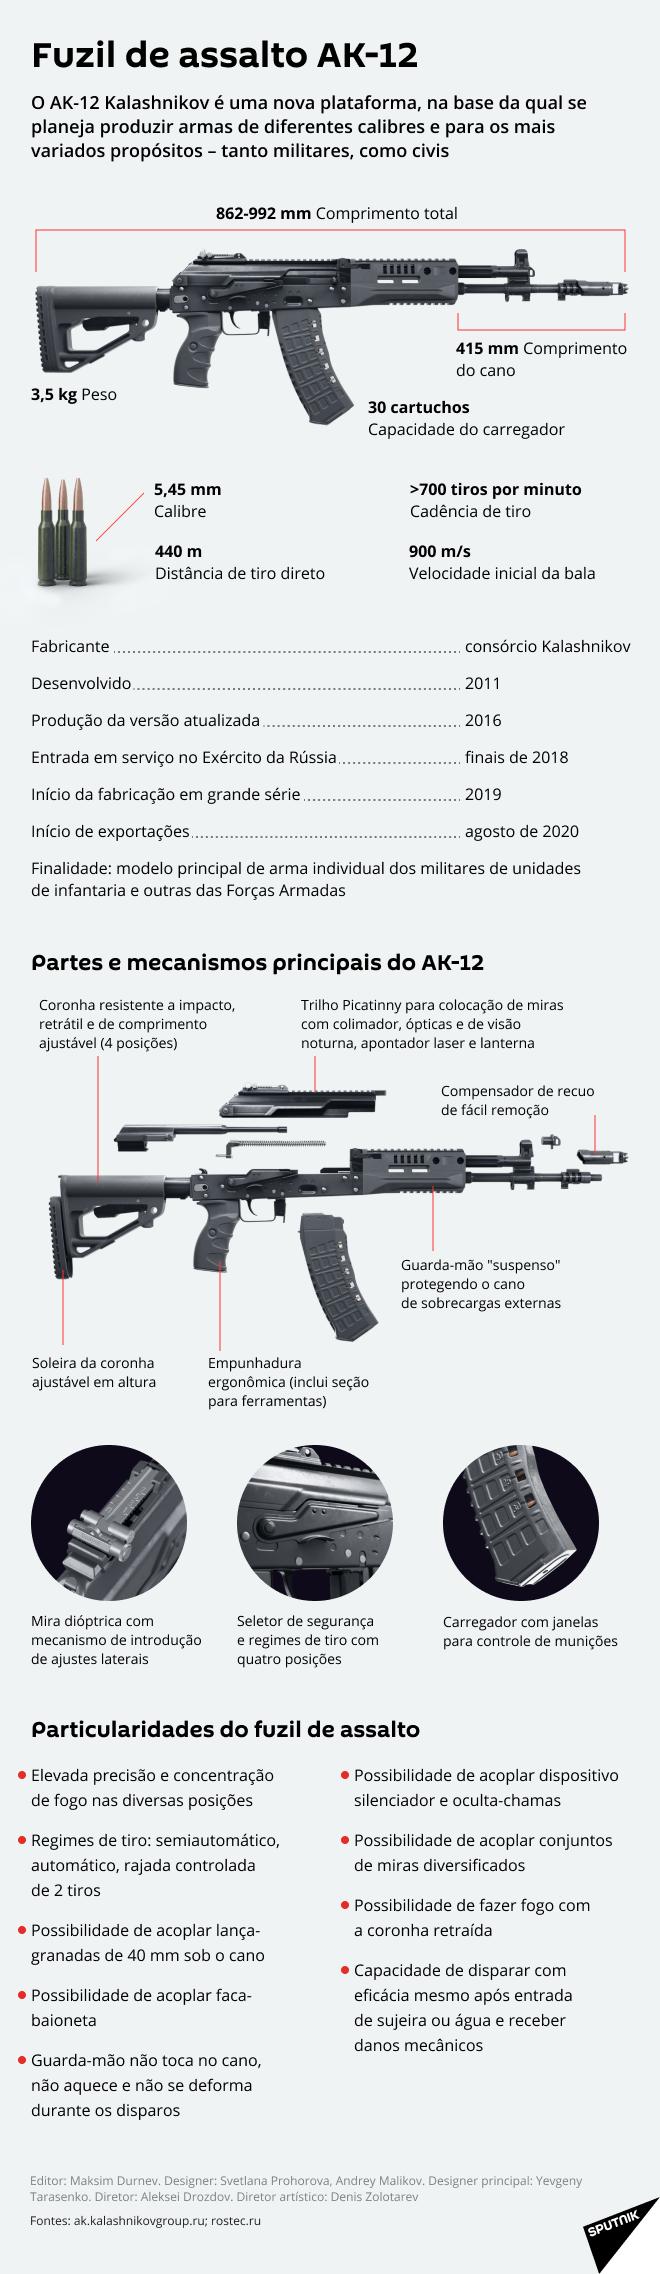 Promissor fuzil AK-12 do Kalashnikov